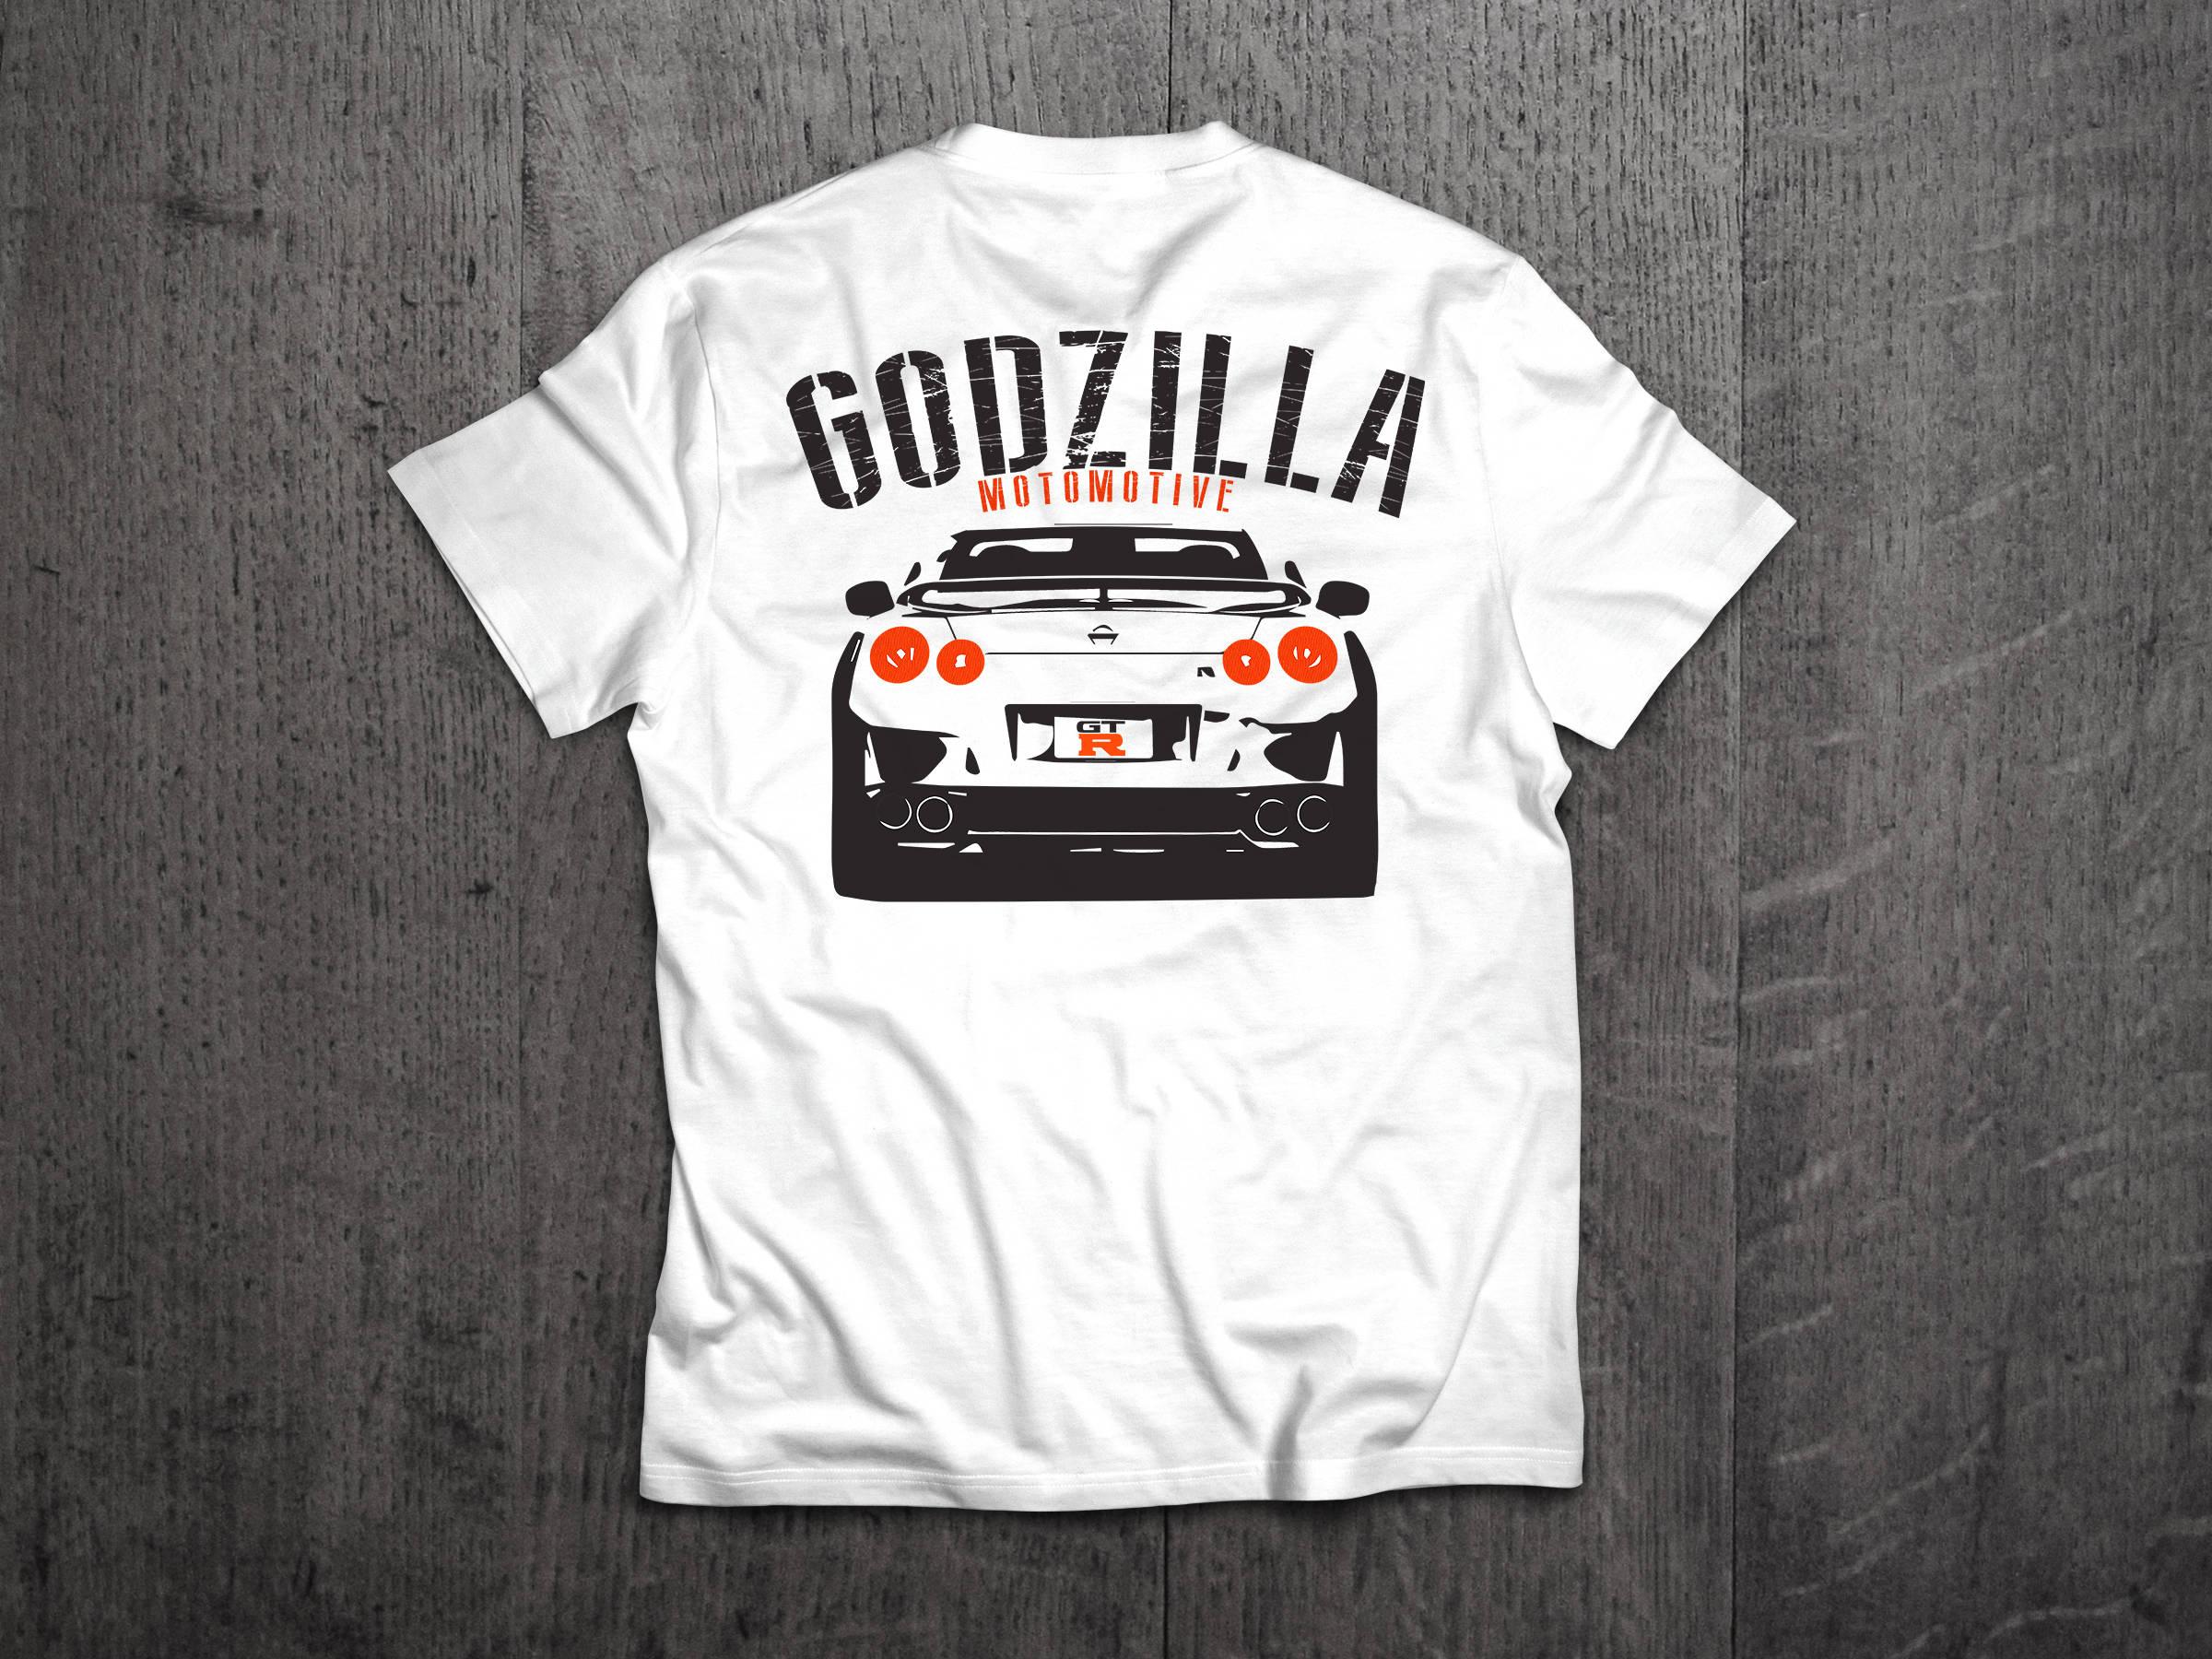 nissan gtr shirts gtr godzilla t shirts nissan shirts cars. Black Bedroom Furniture Sets. Home Design Ideas